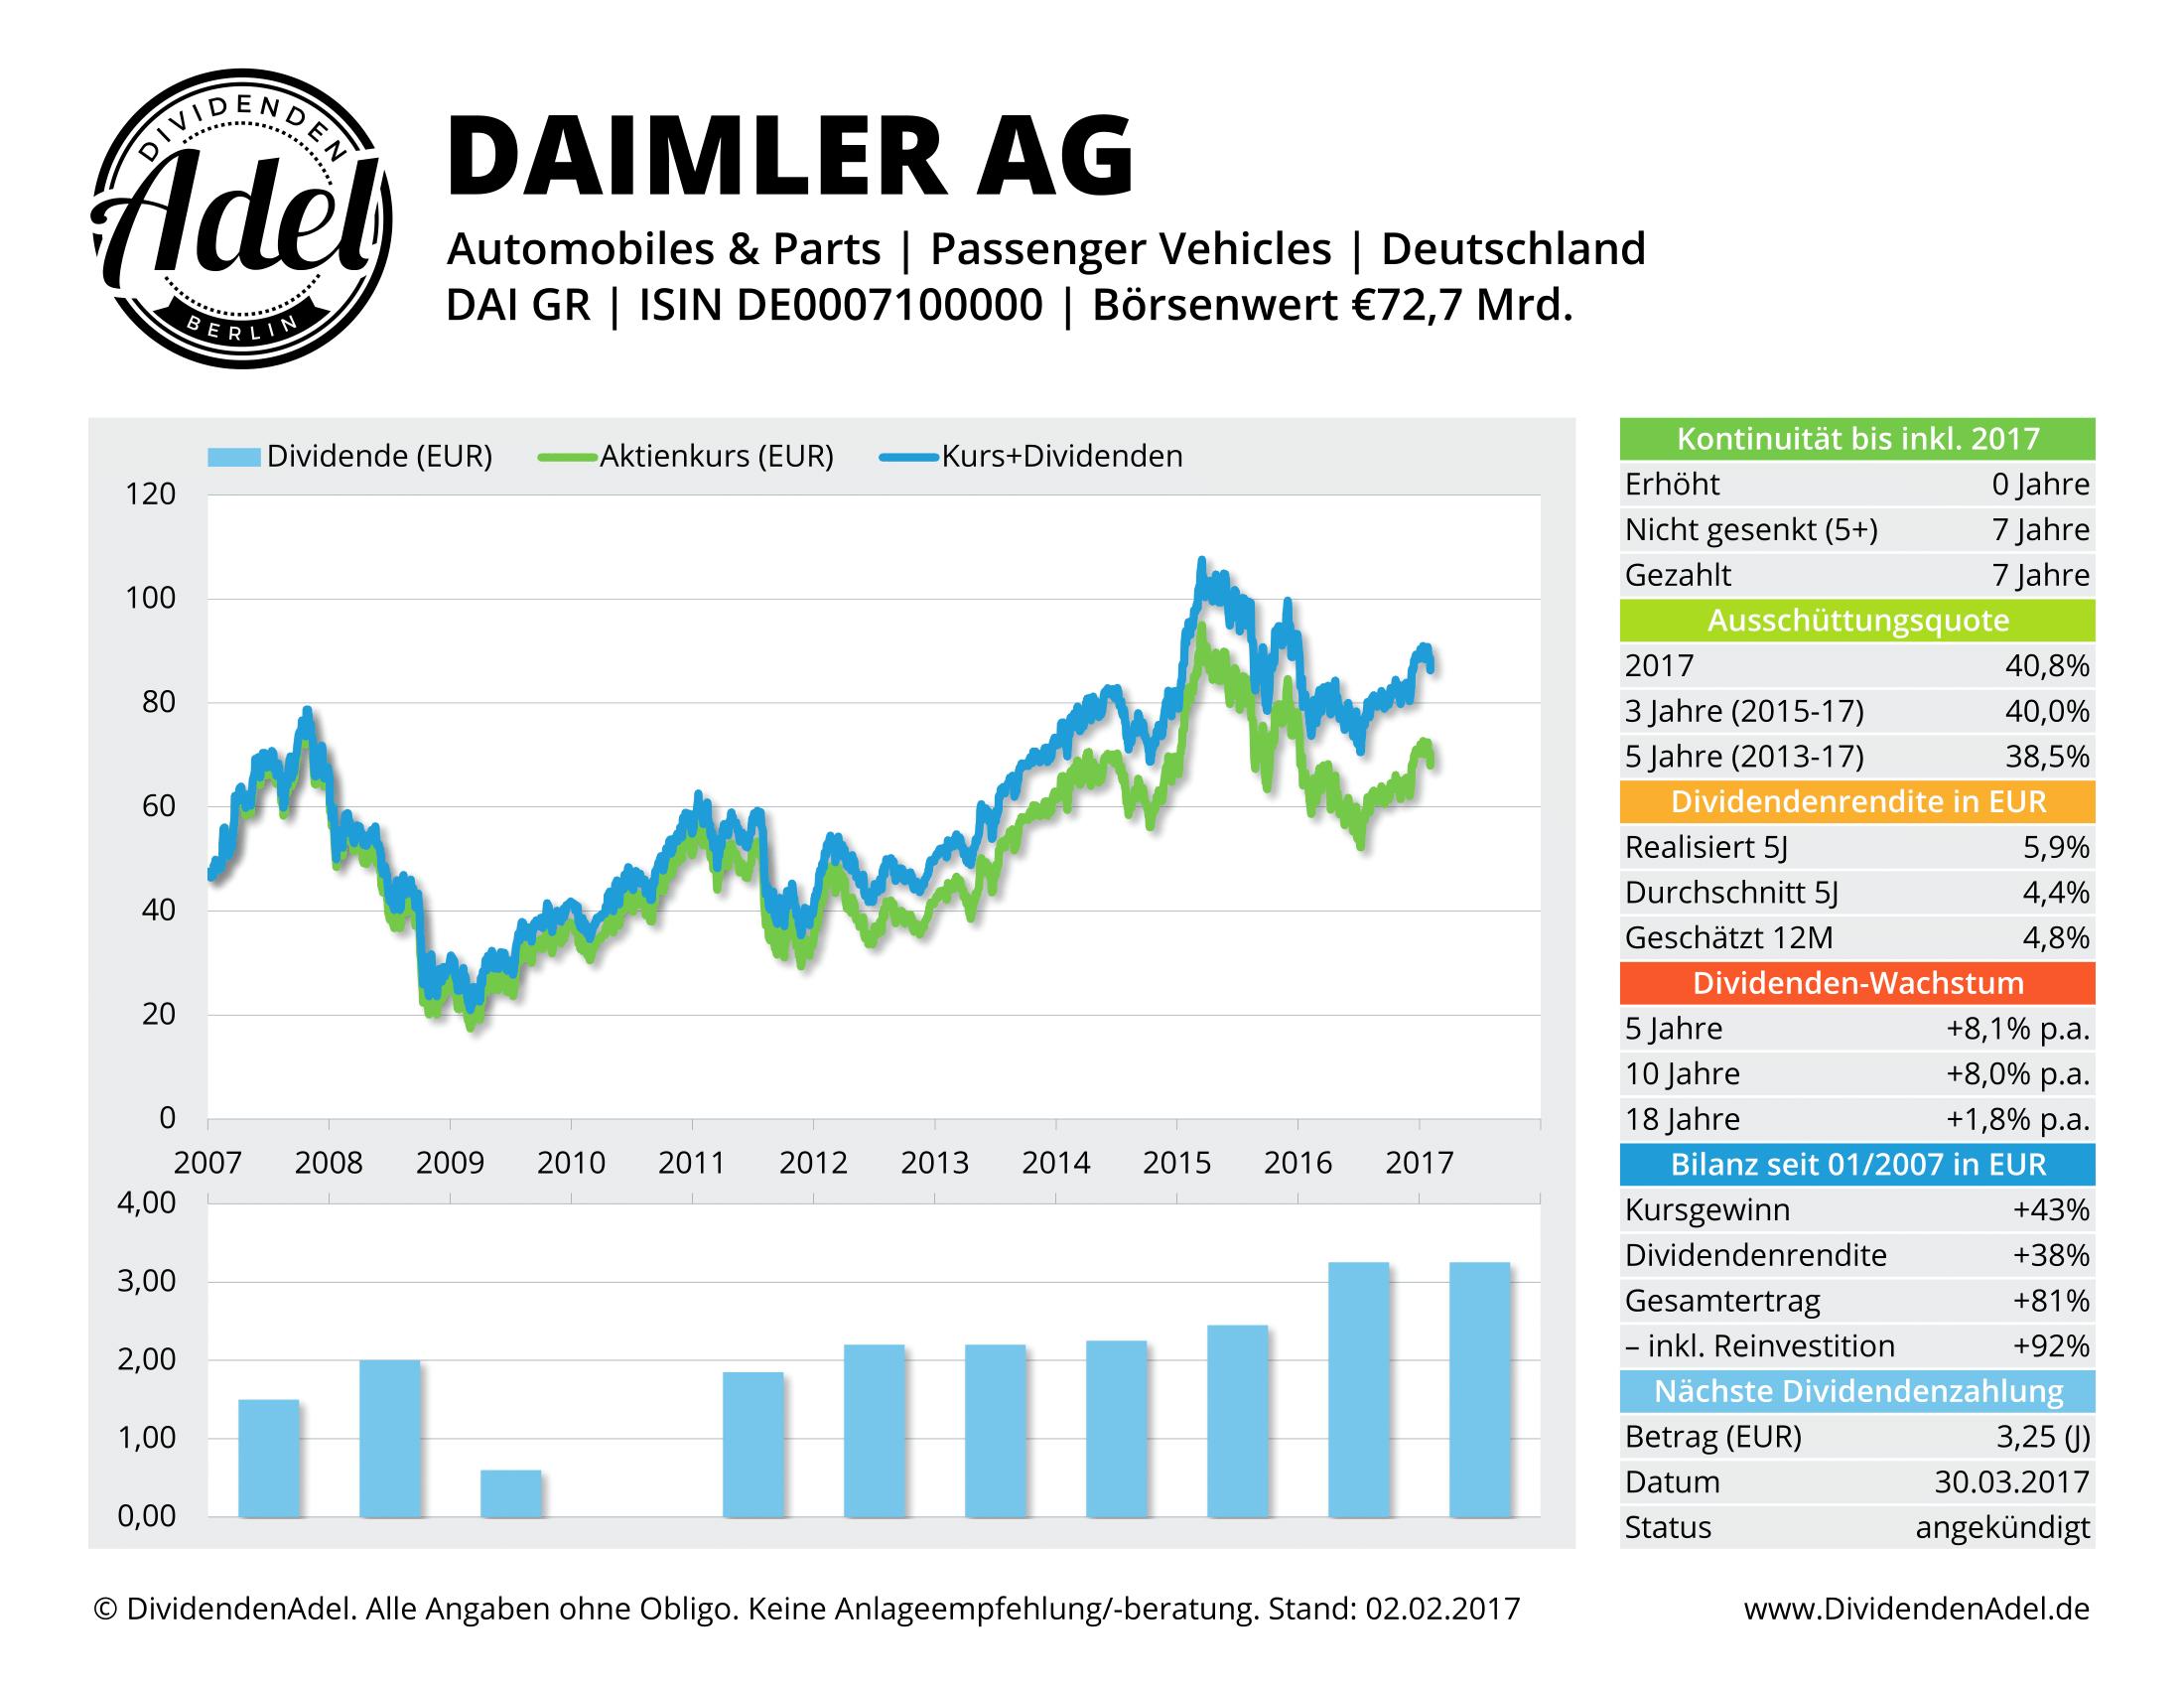 DividendenAdel Dividendenprofil Daimler